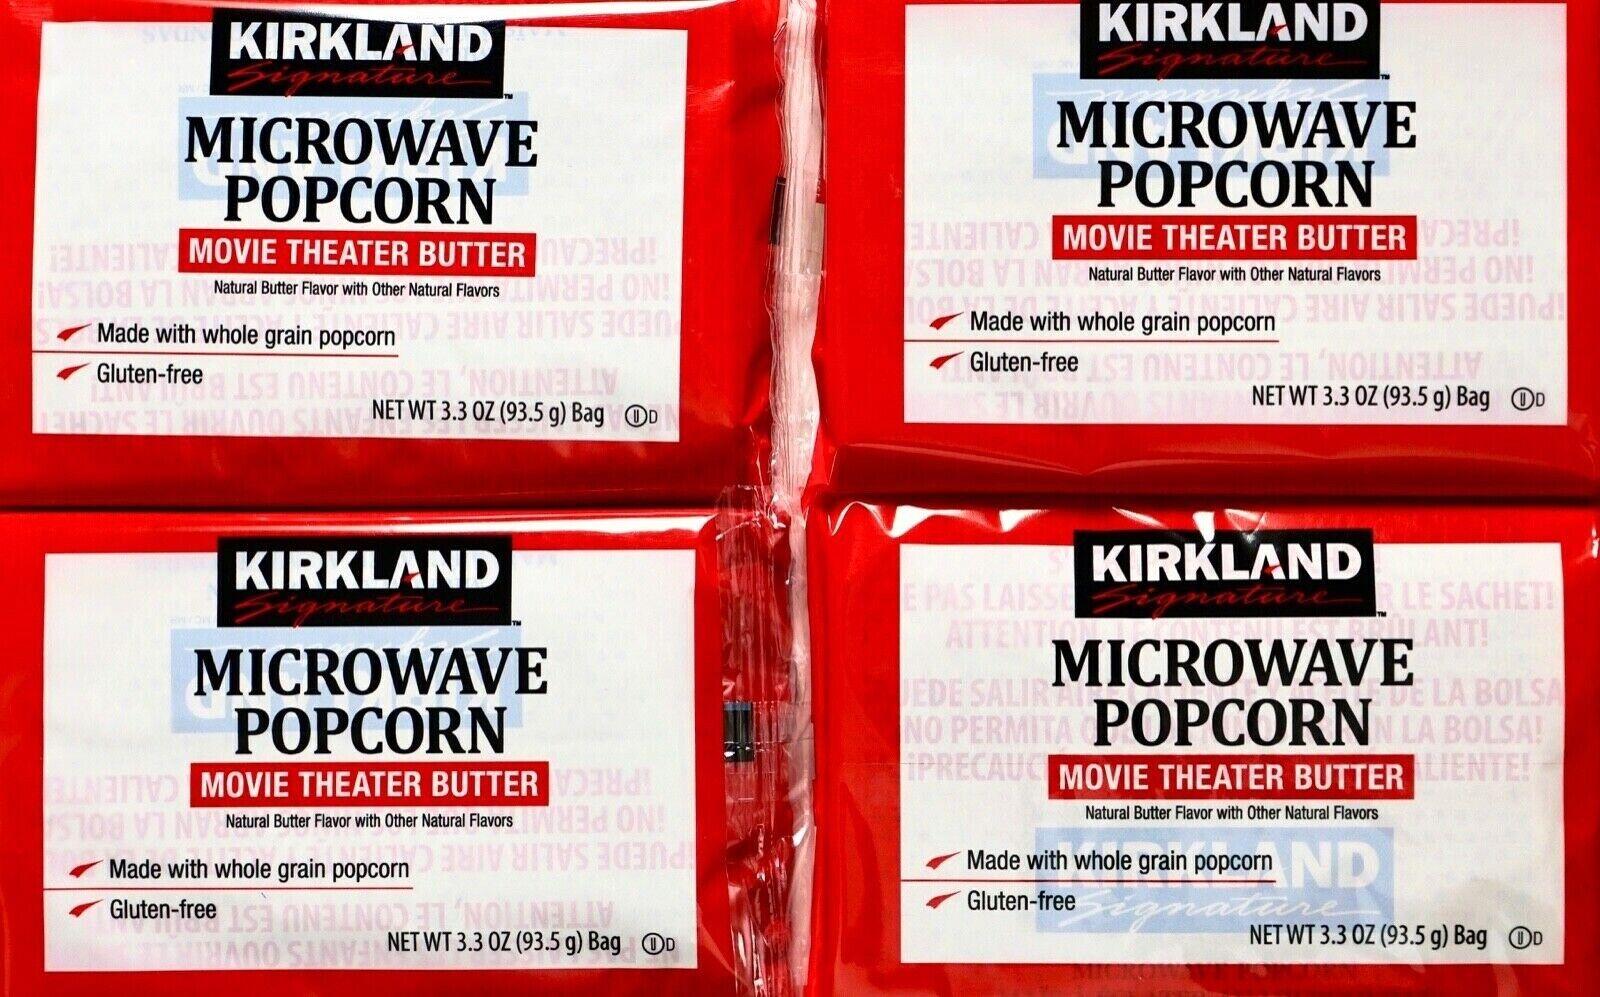 popcorn 44 bags 3 3 oz kirkland microwave movie theater butter